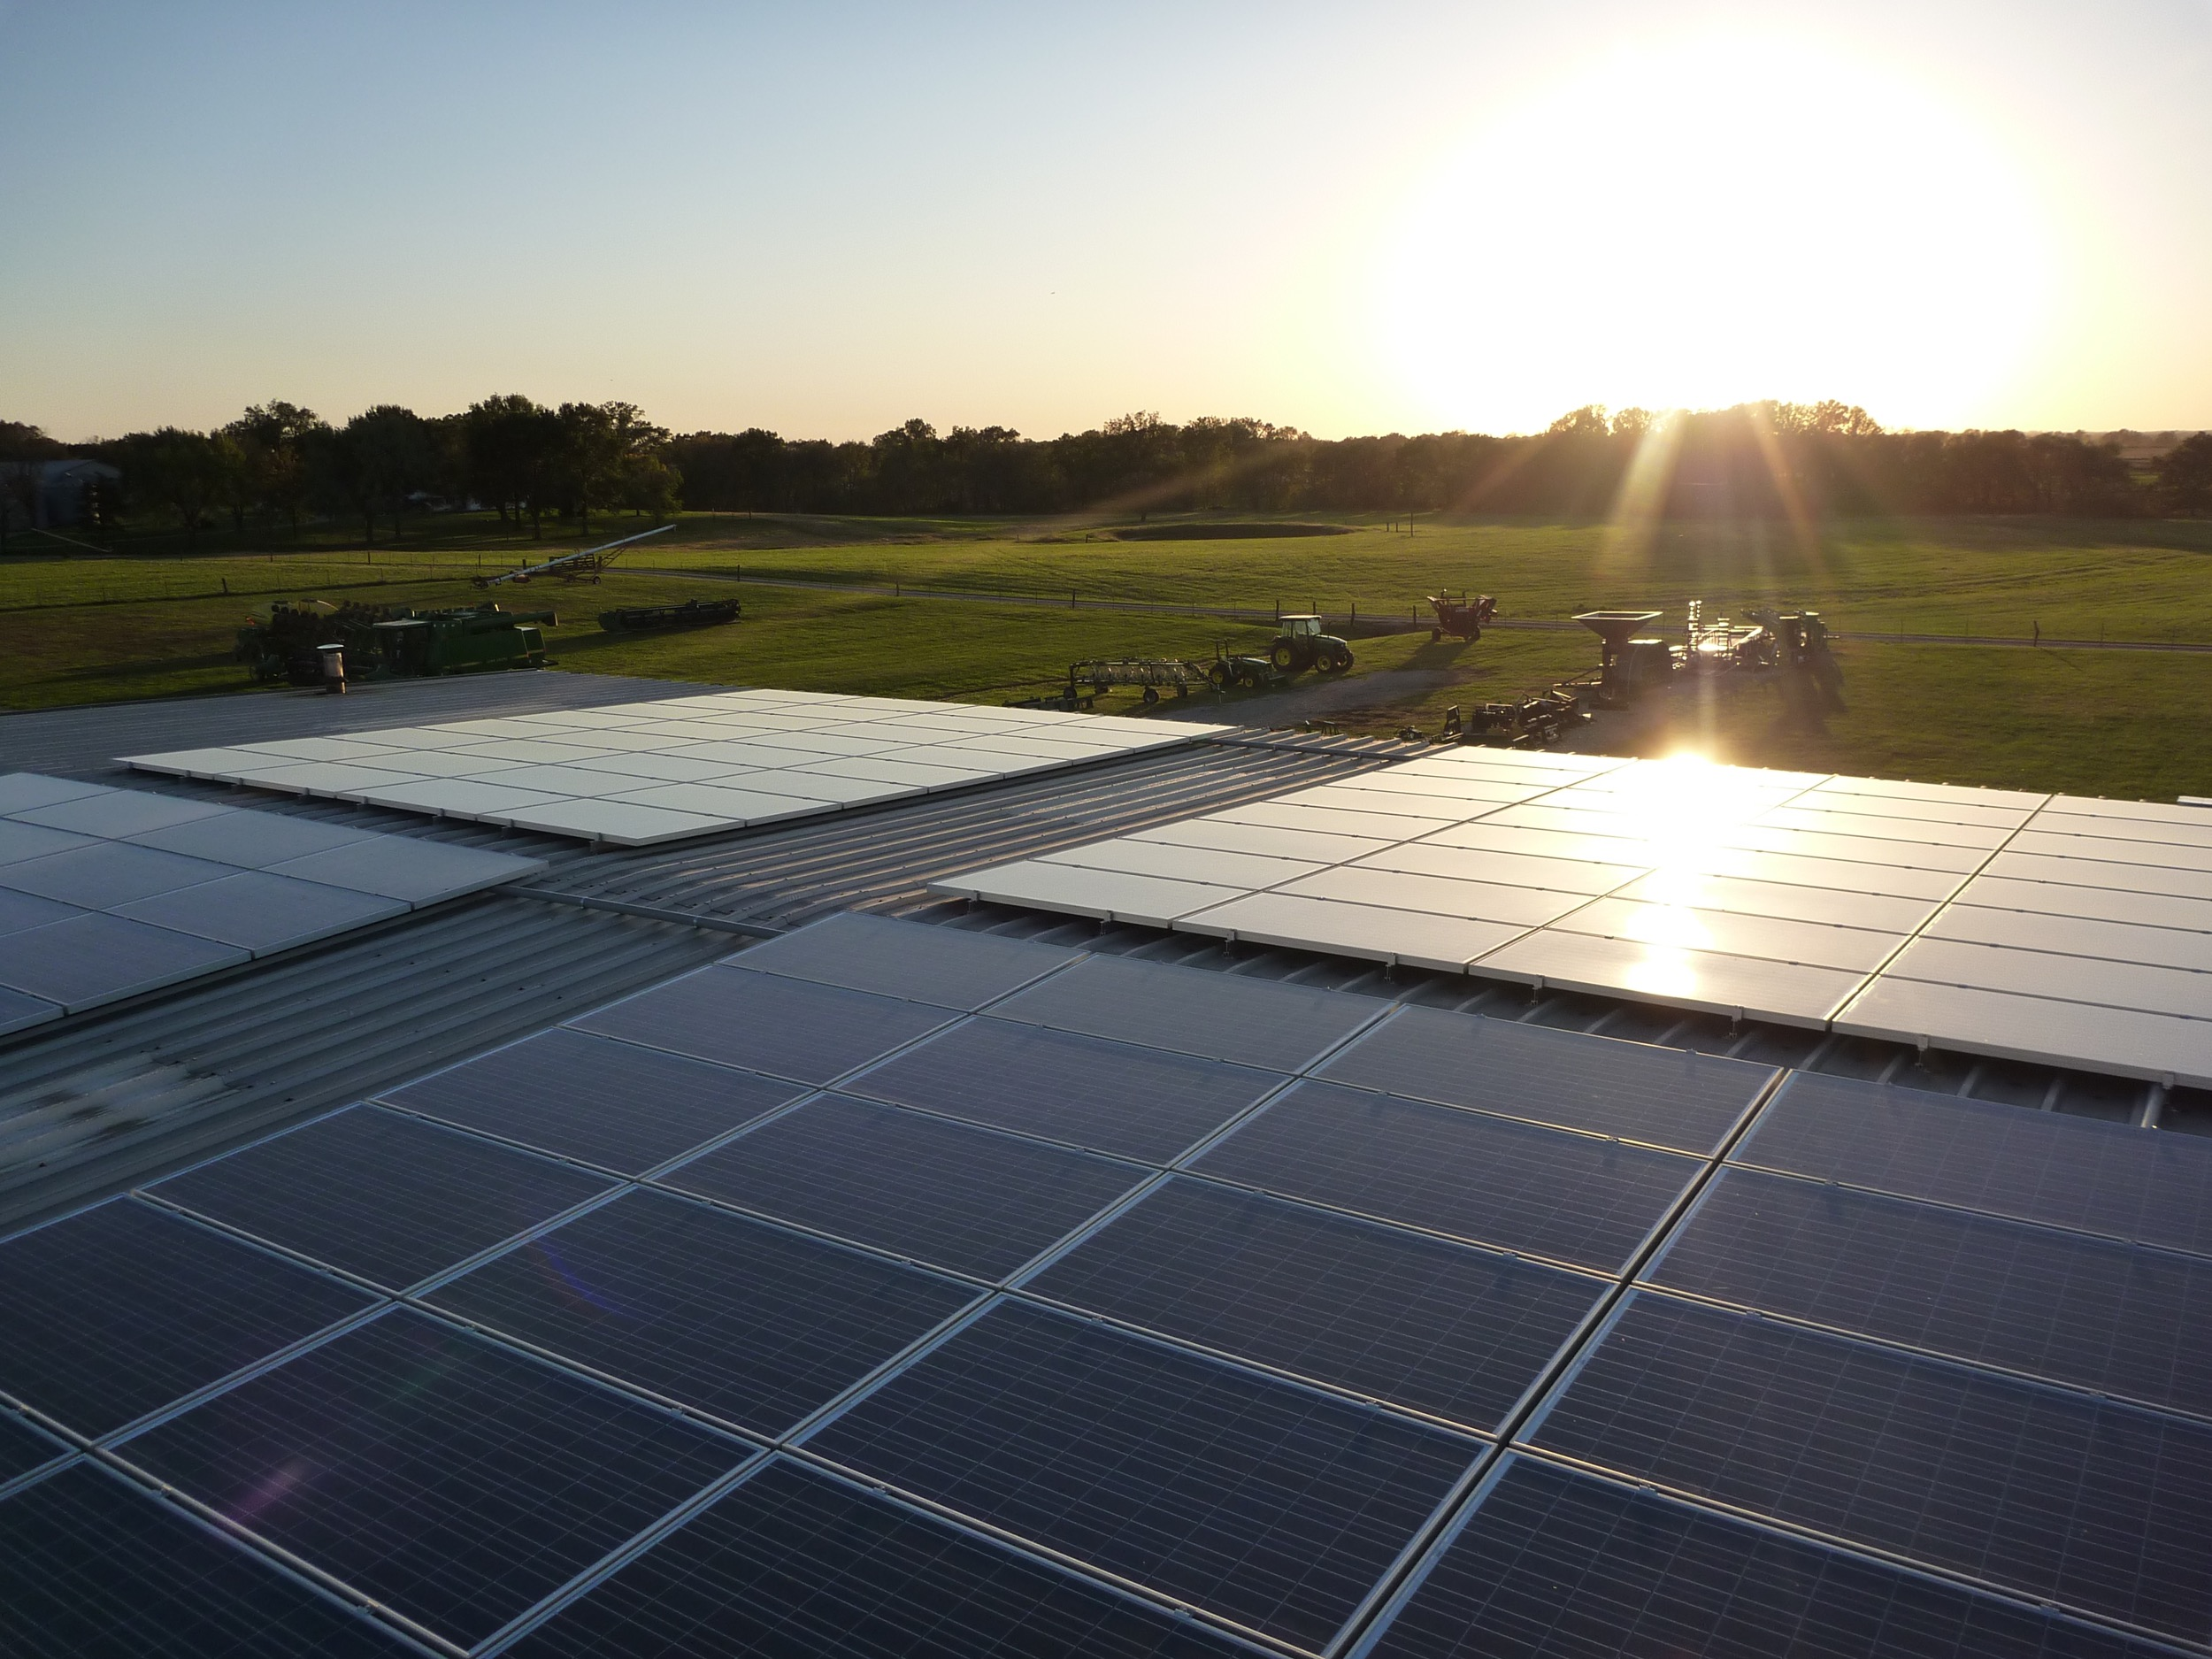 Large solar array on a farm © 2015 Cromwell Environmental